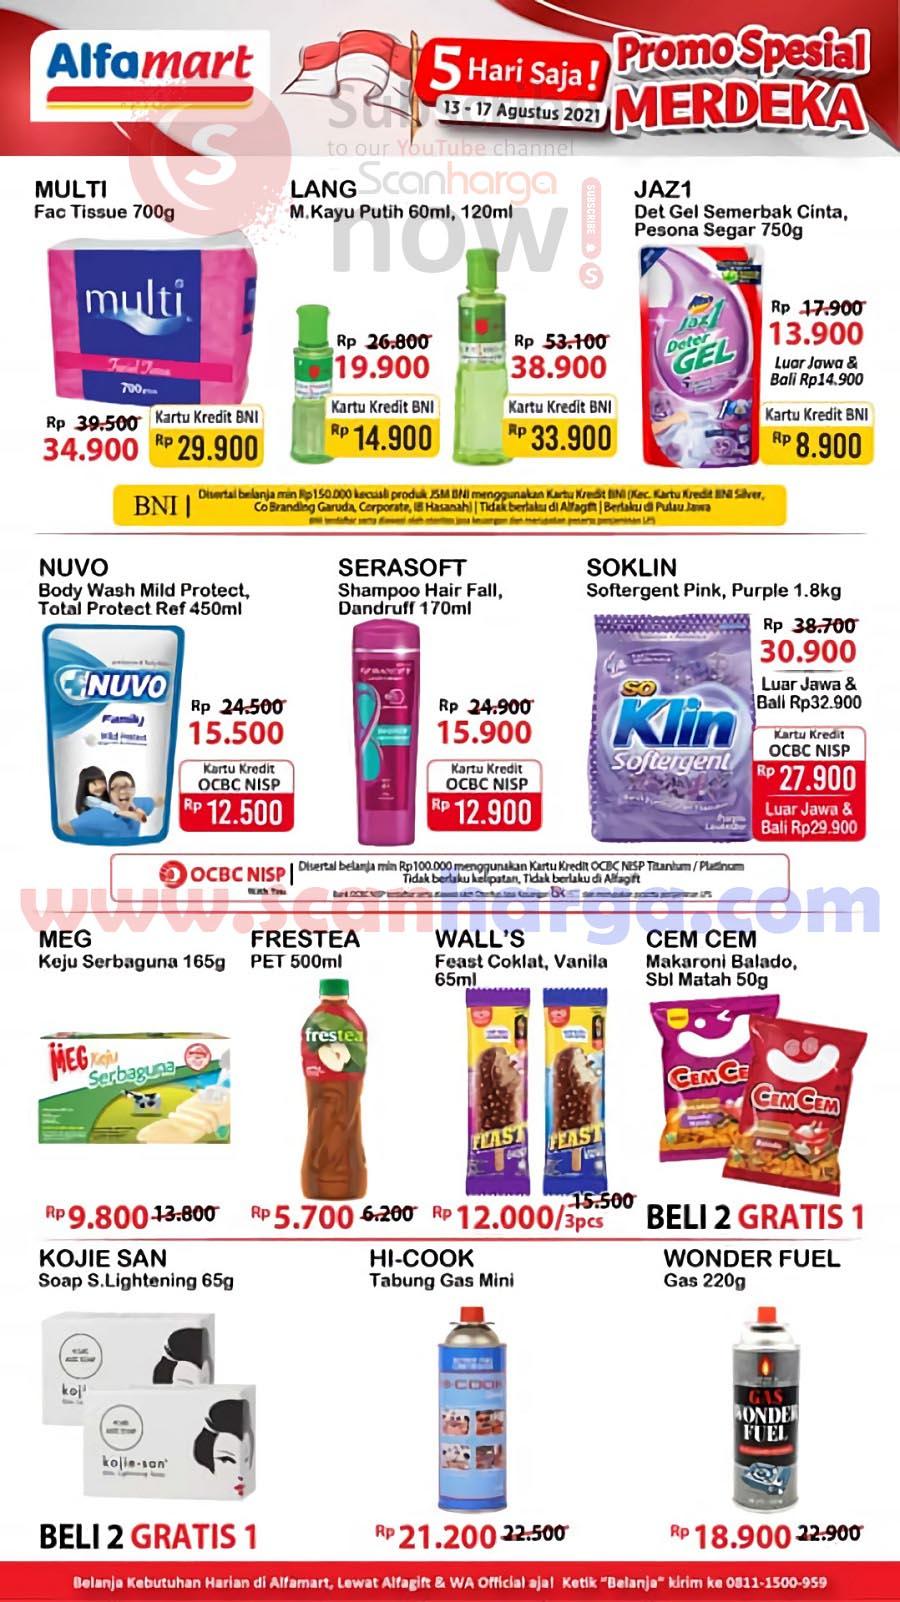 Katalog Promo JSM Alfamart Weekend 13 - 17 Agustus 2021 2